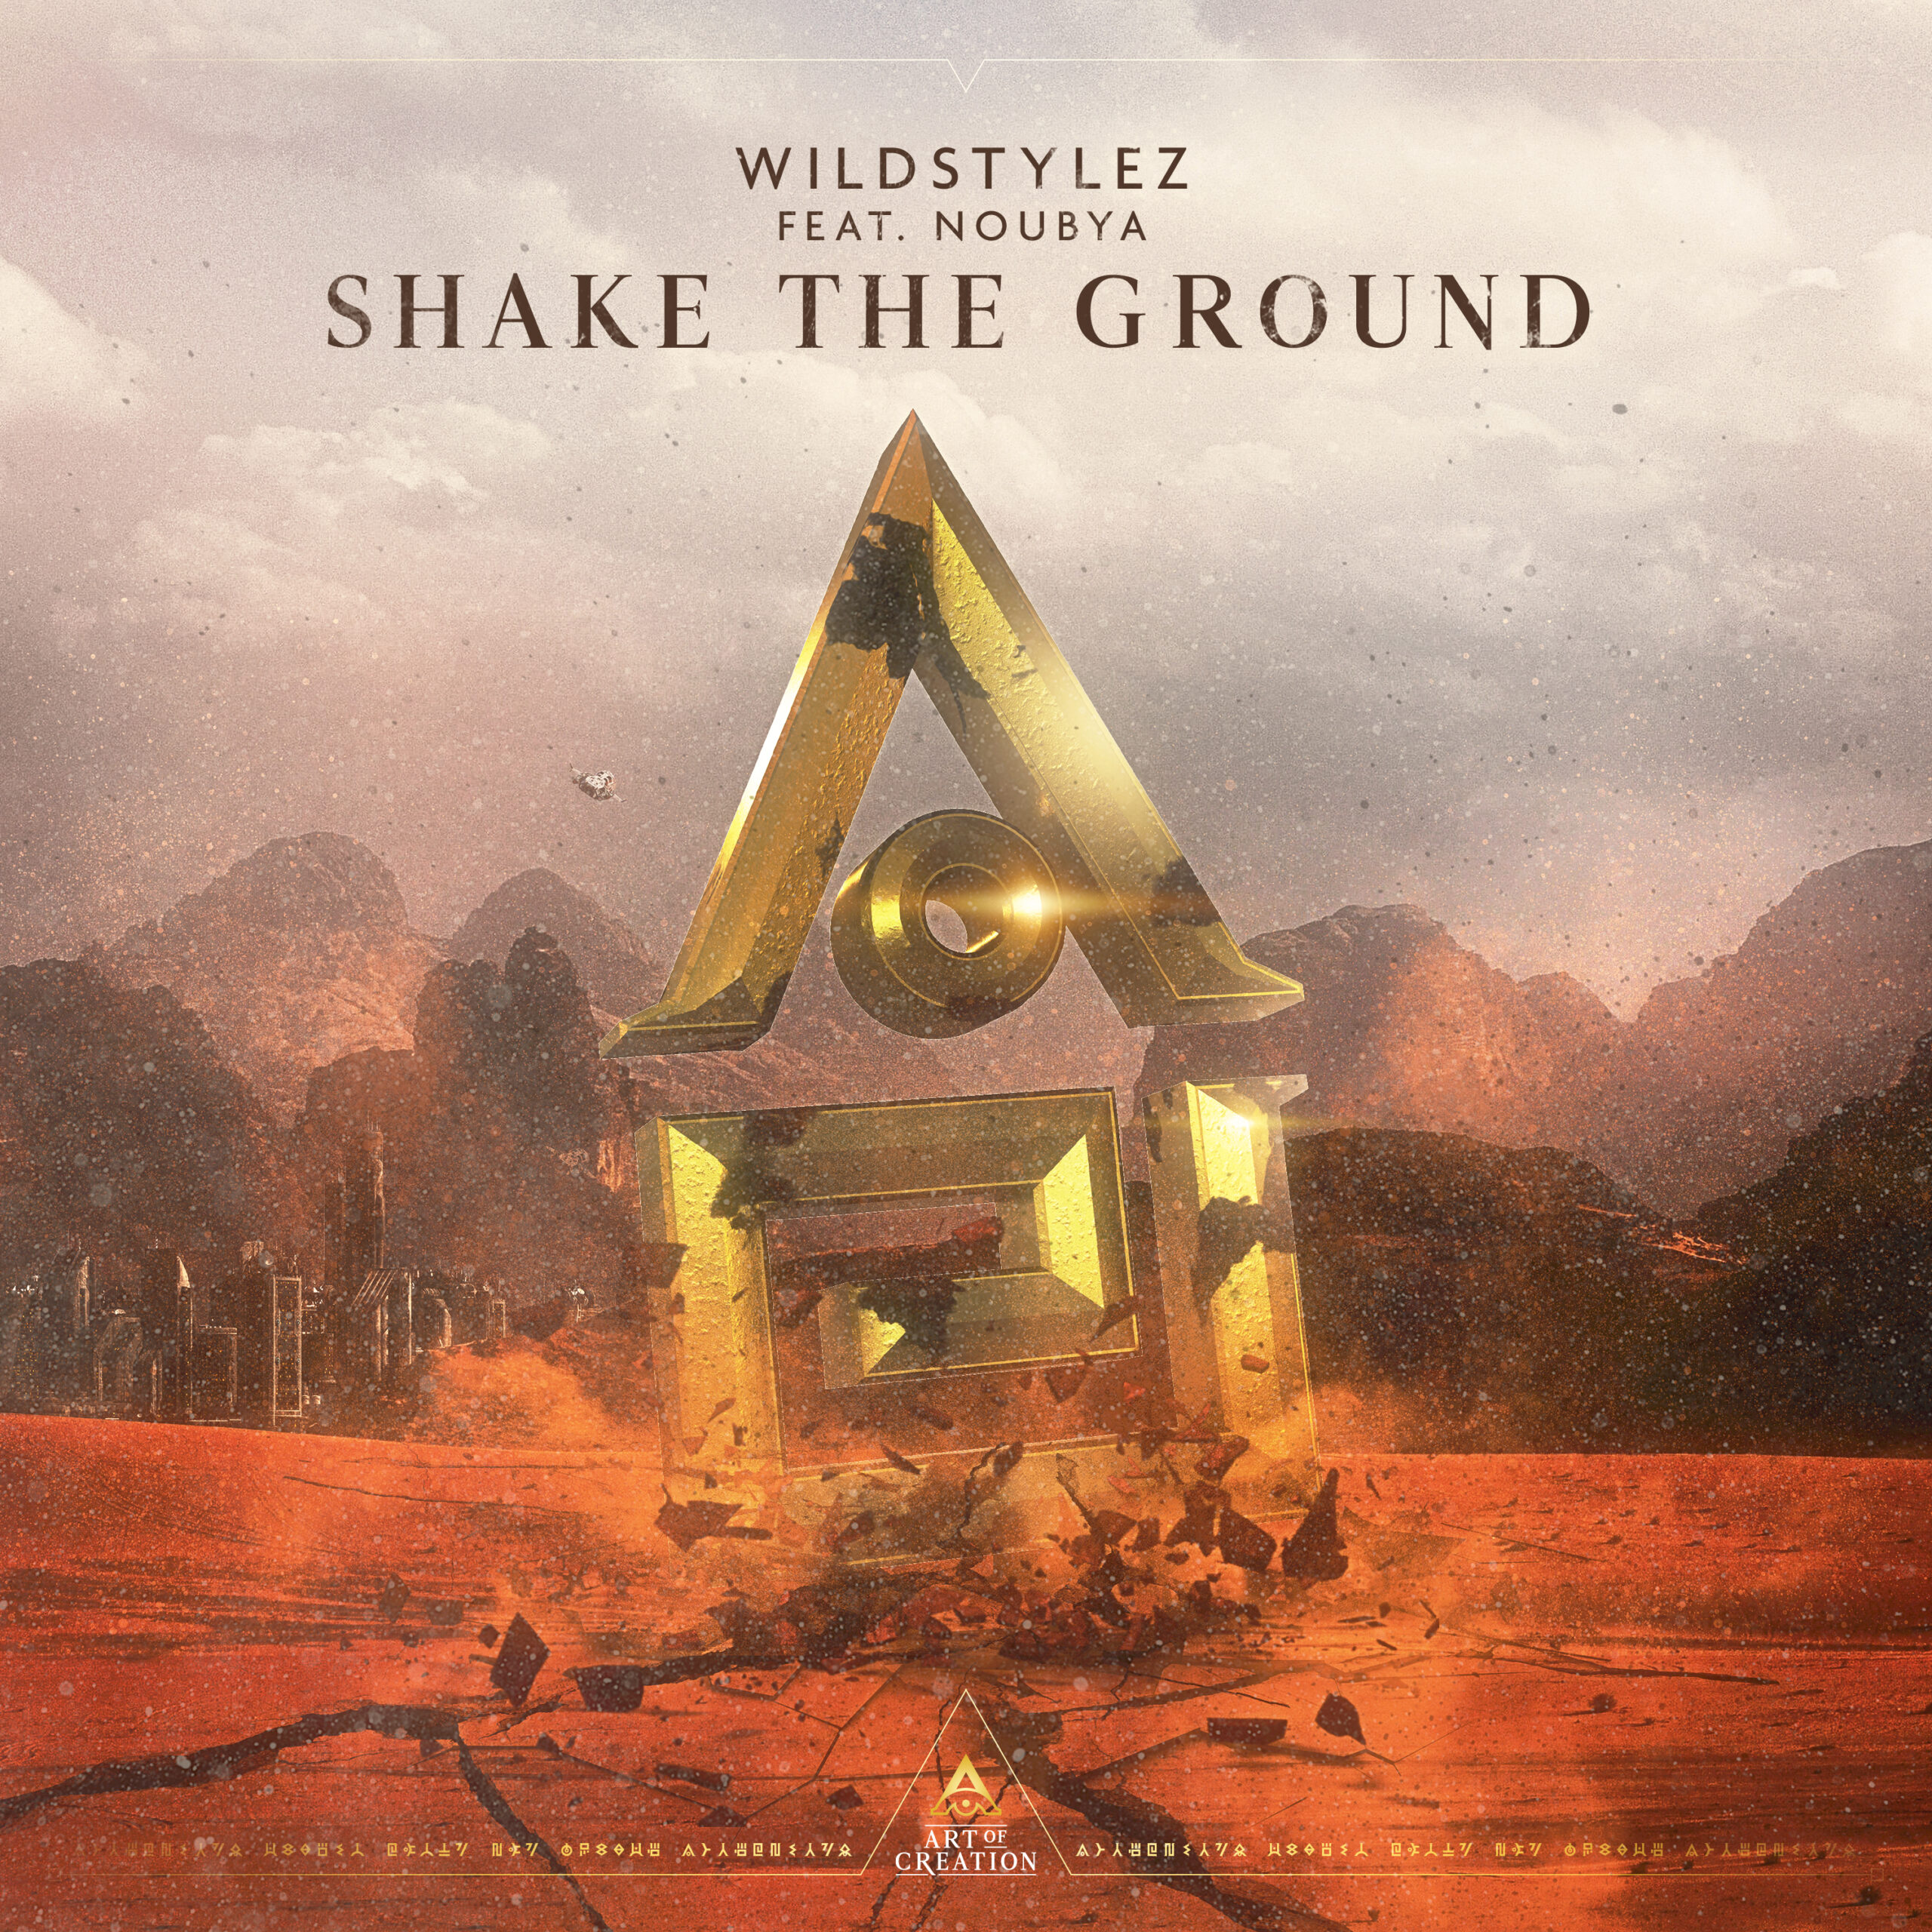 Wildstylez ft. Noubya - Shake The Ground